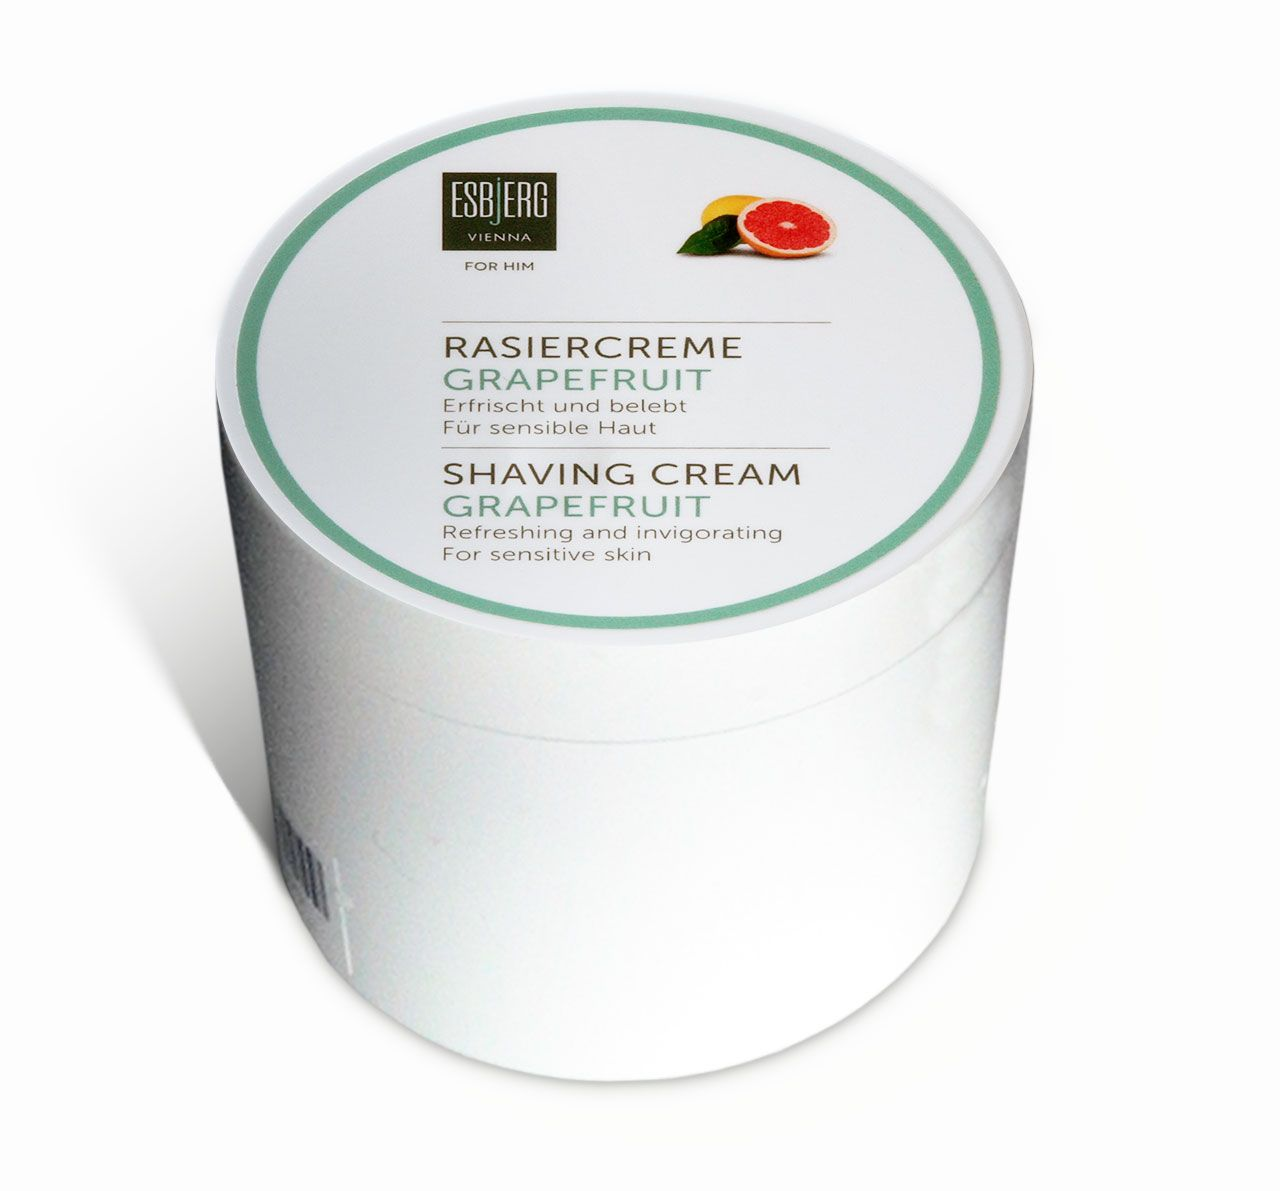 You are currently viewing Esbjerg Vienna Rasiercreme Grapefruit (Shaving Cream) – recenzja kremu do golenia